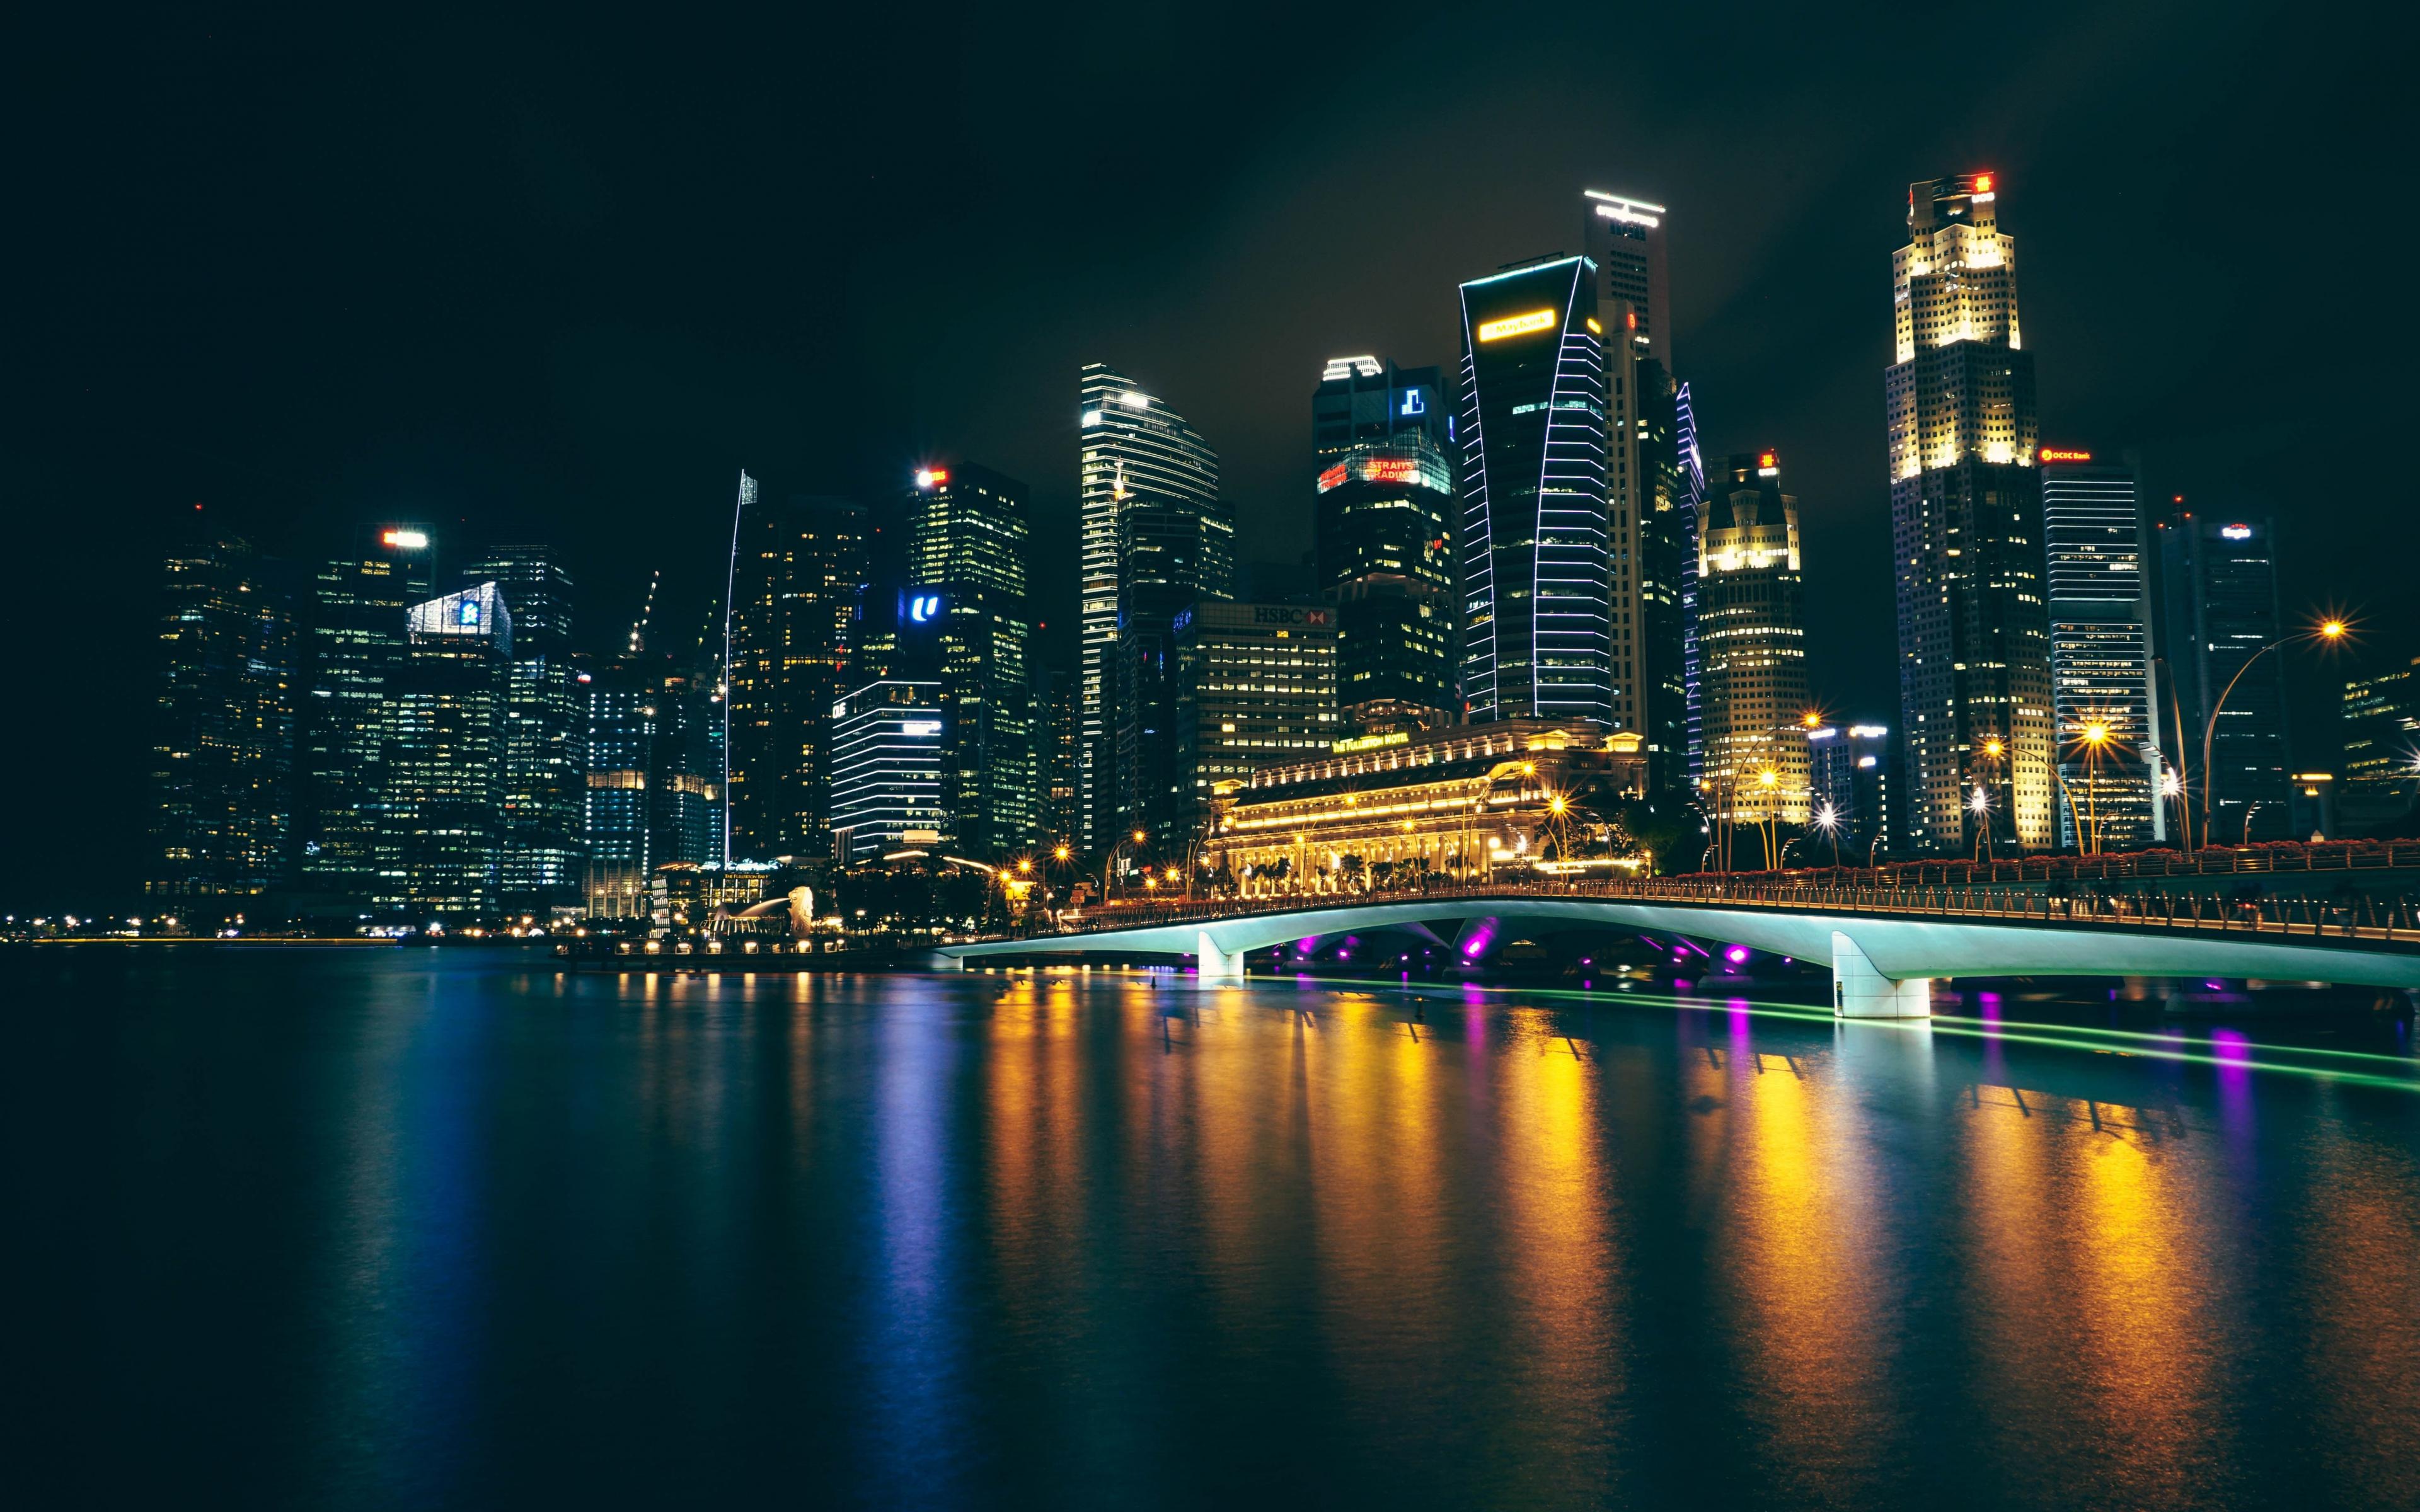 Download 3840x2400 wallpaper city, night, buildings ...